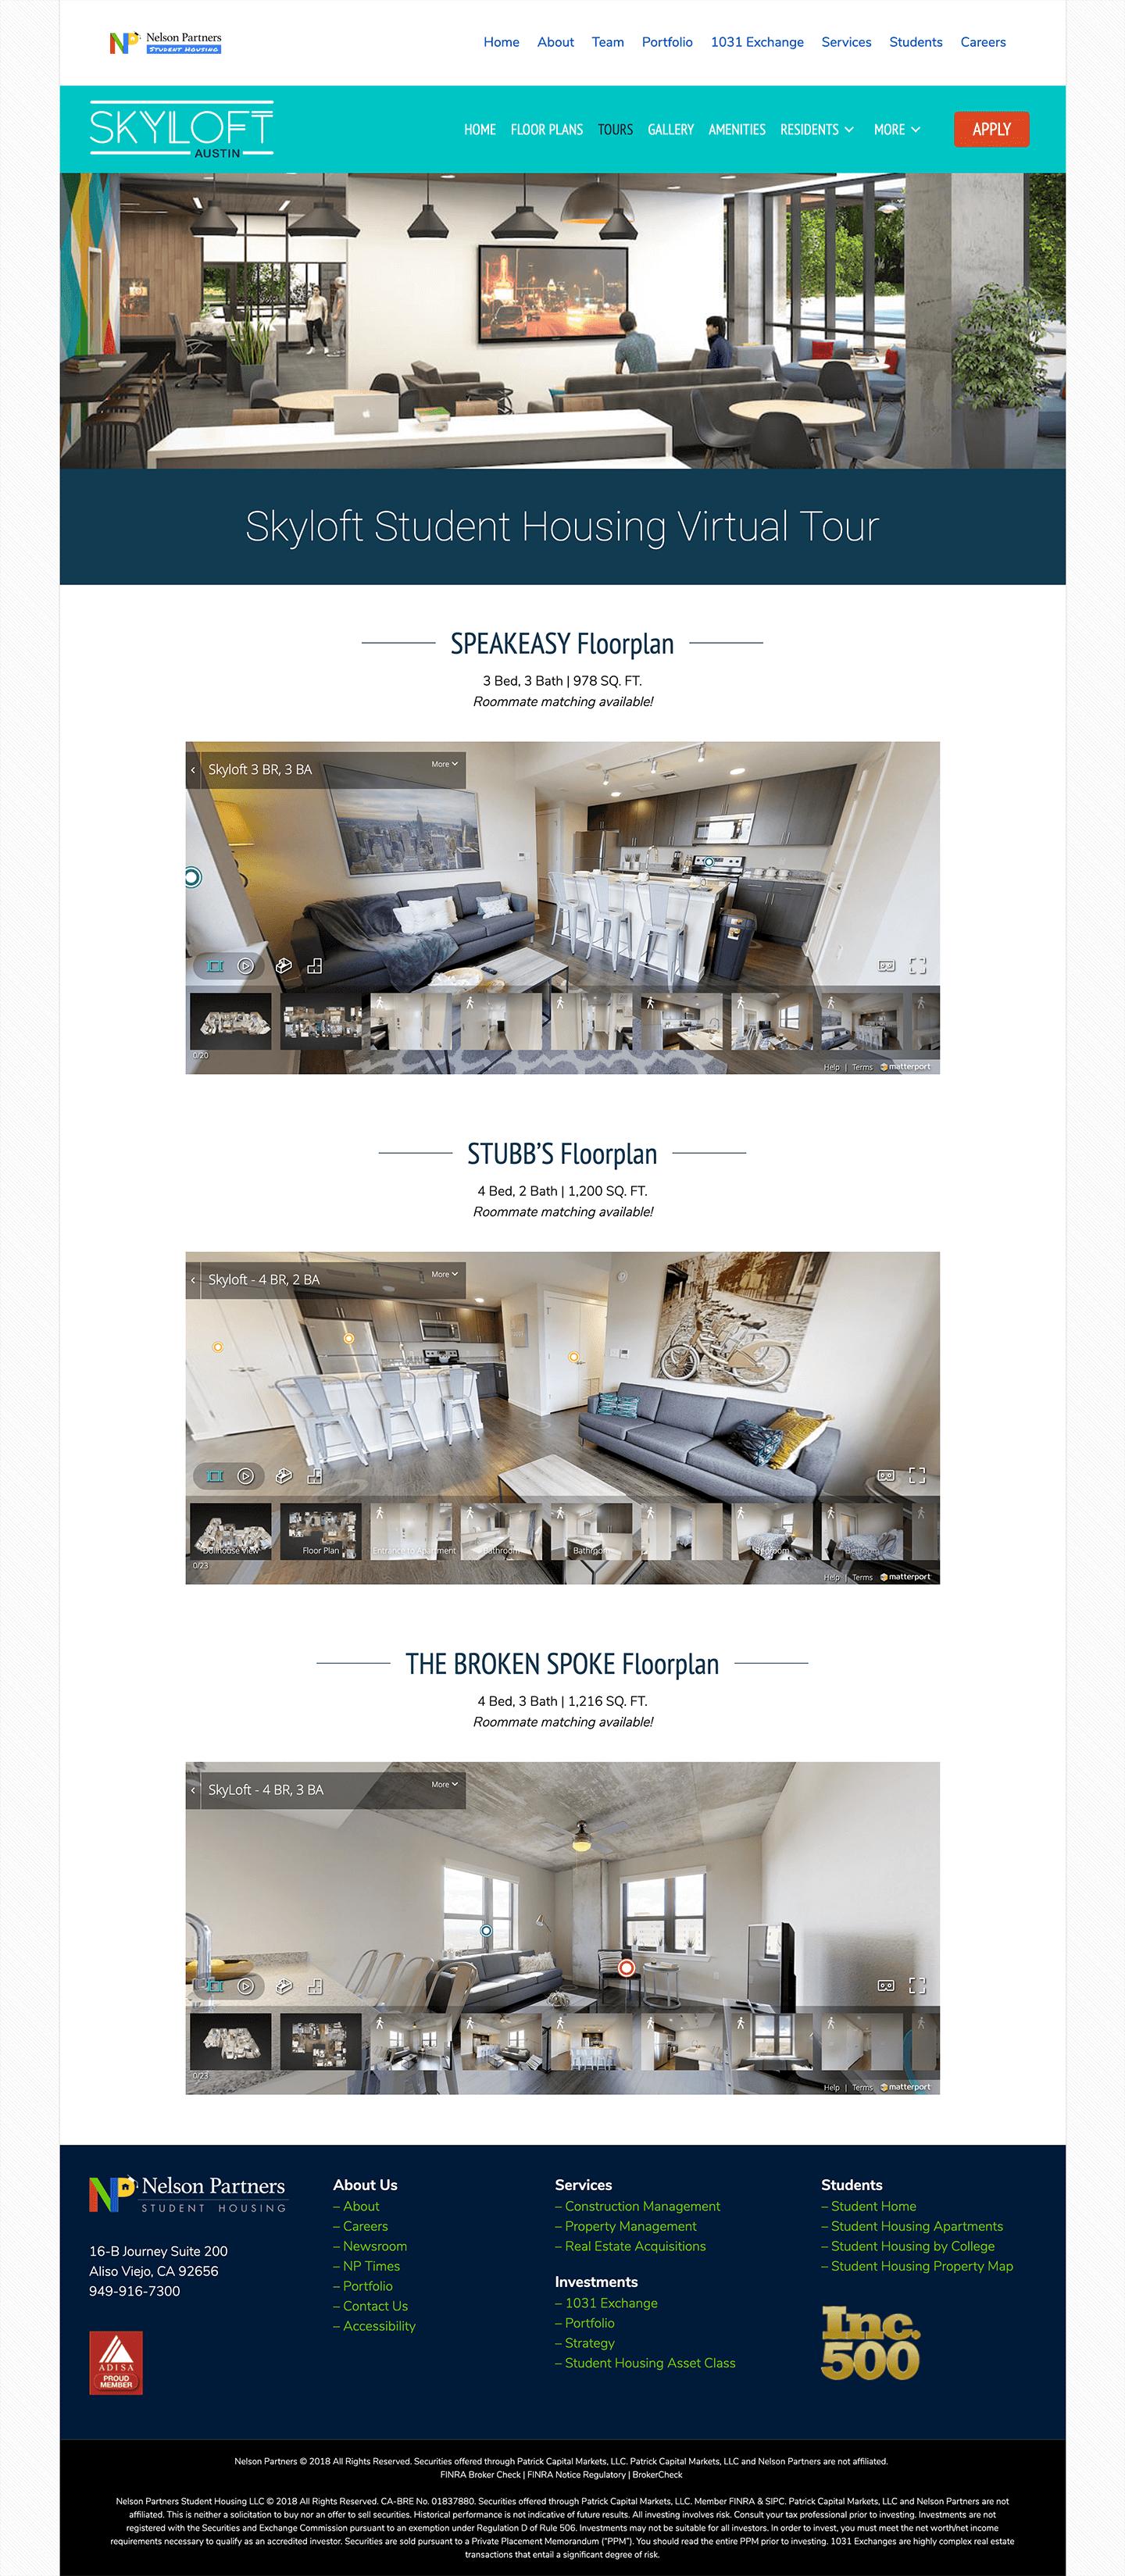 Skyloft-Student-Housing-Apartments-Website-Design-Virtual-Tour-Page